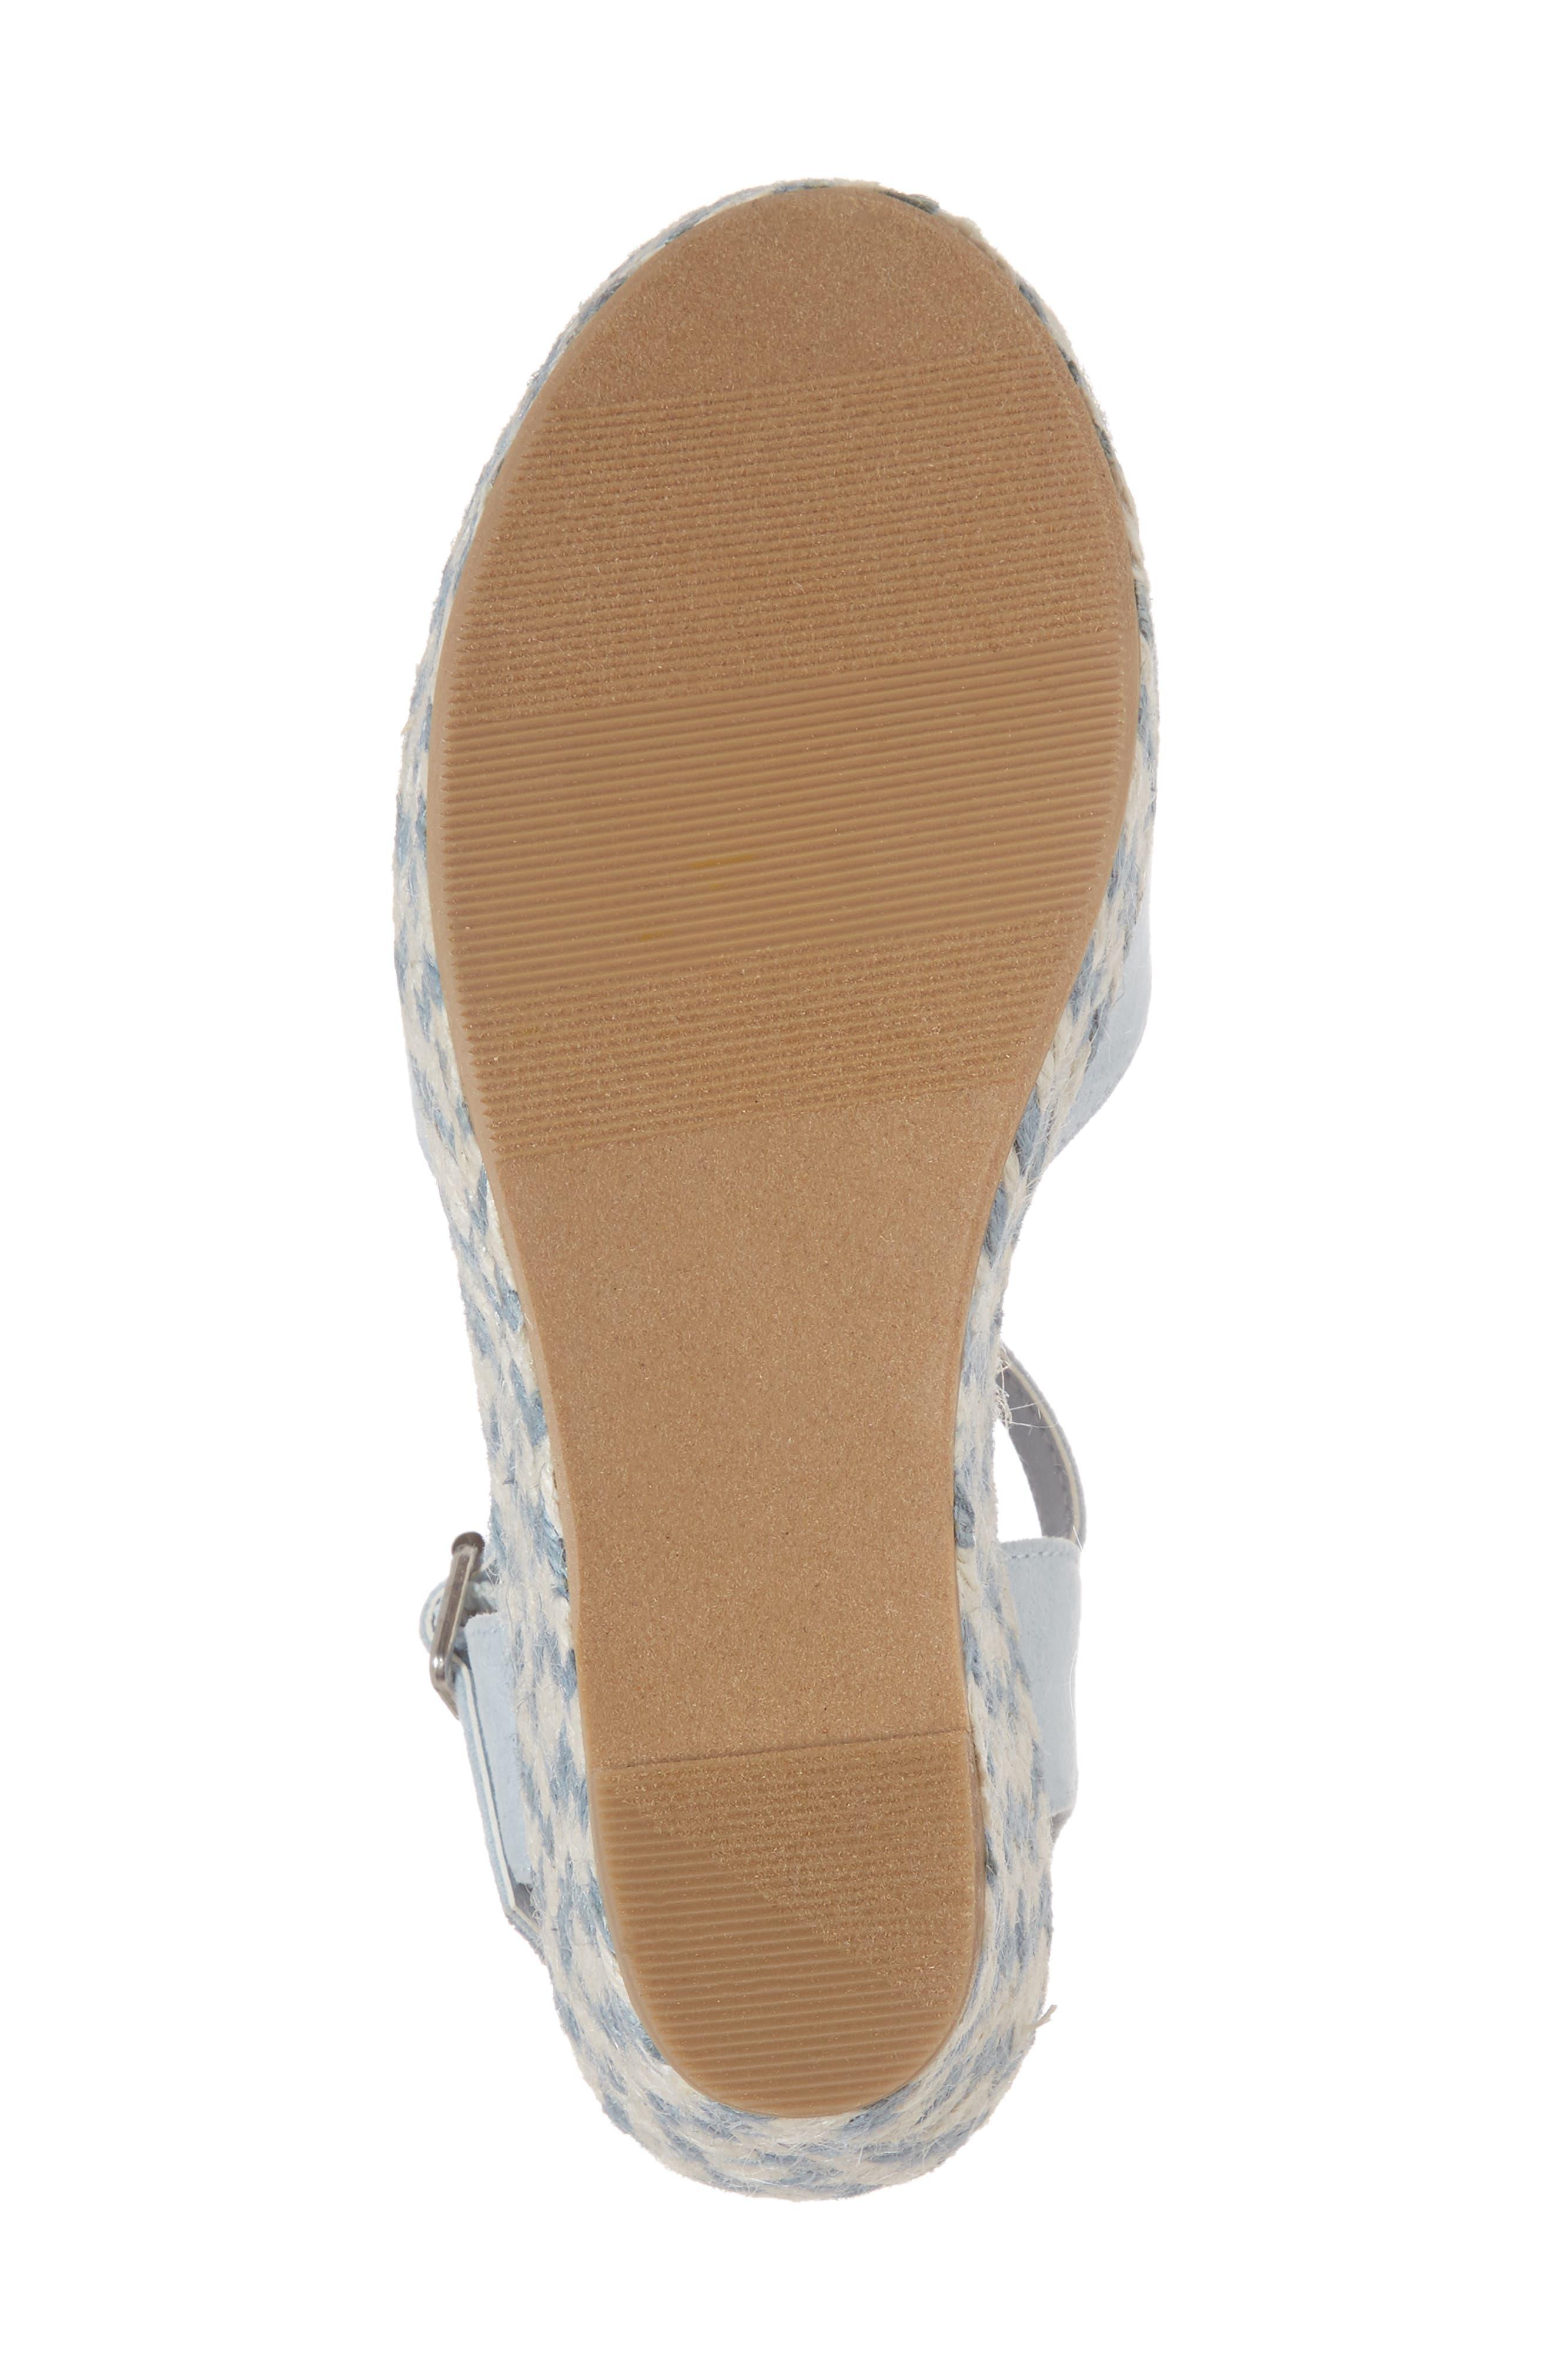 Wendy Espadrille Wedge Sandal,                             Alternate thumbnail 6, color,                             Light Blue